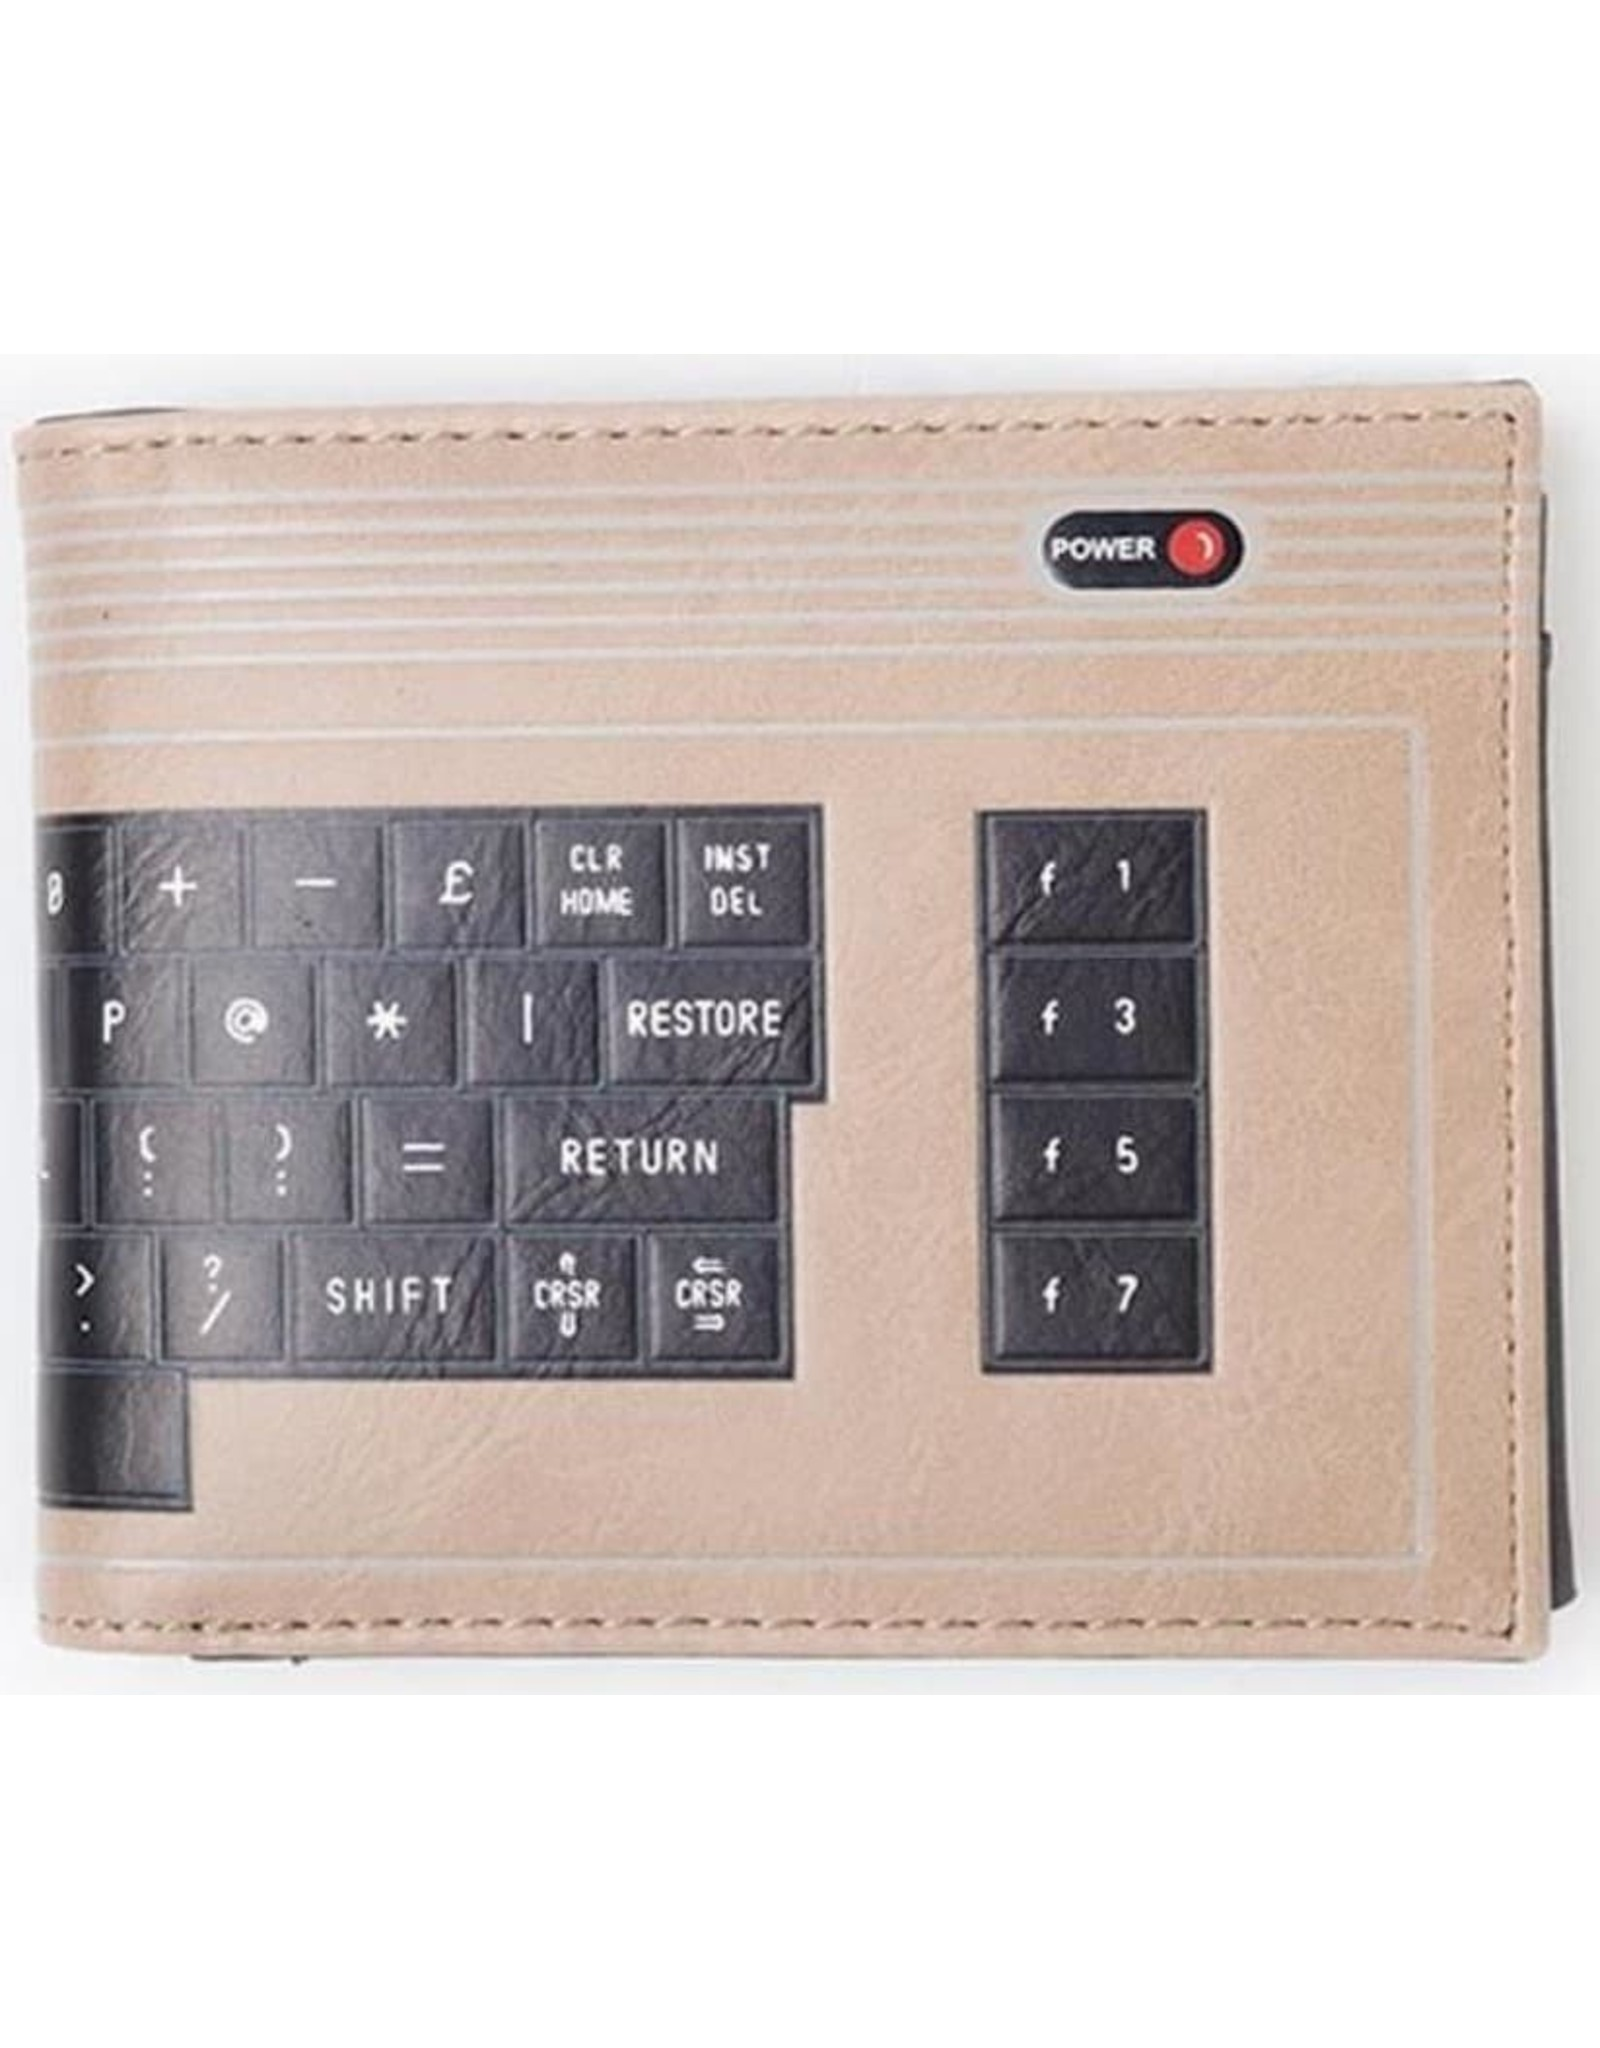 Commodore64 Merchandise portemonnees - Commodore 64 keyboard portemonnee